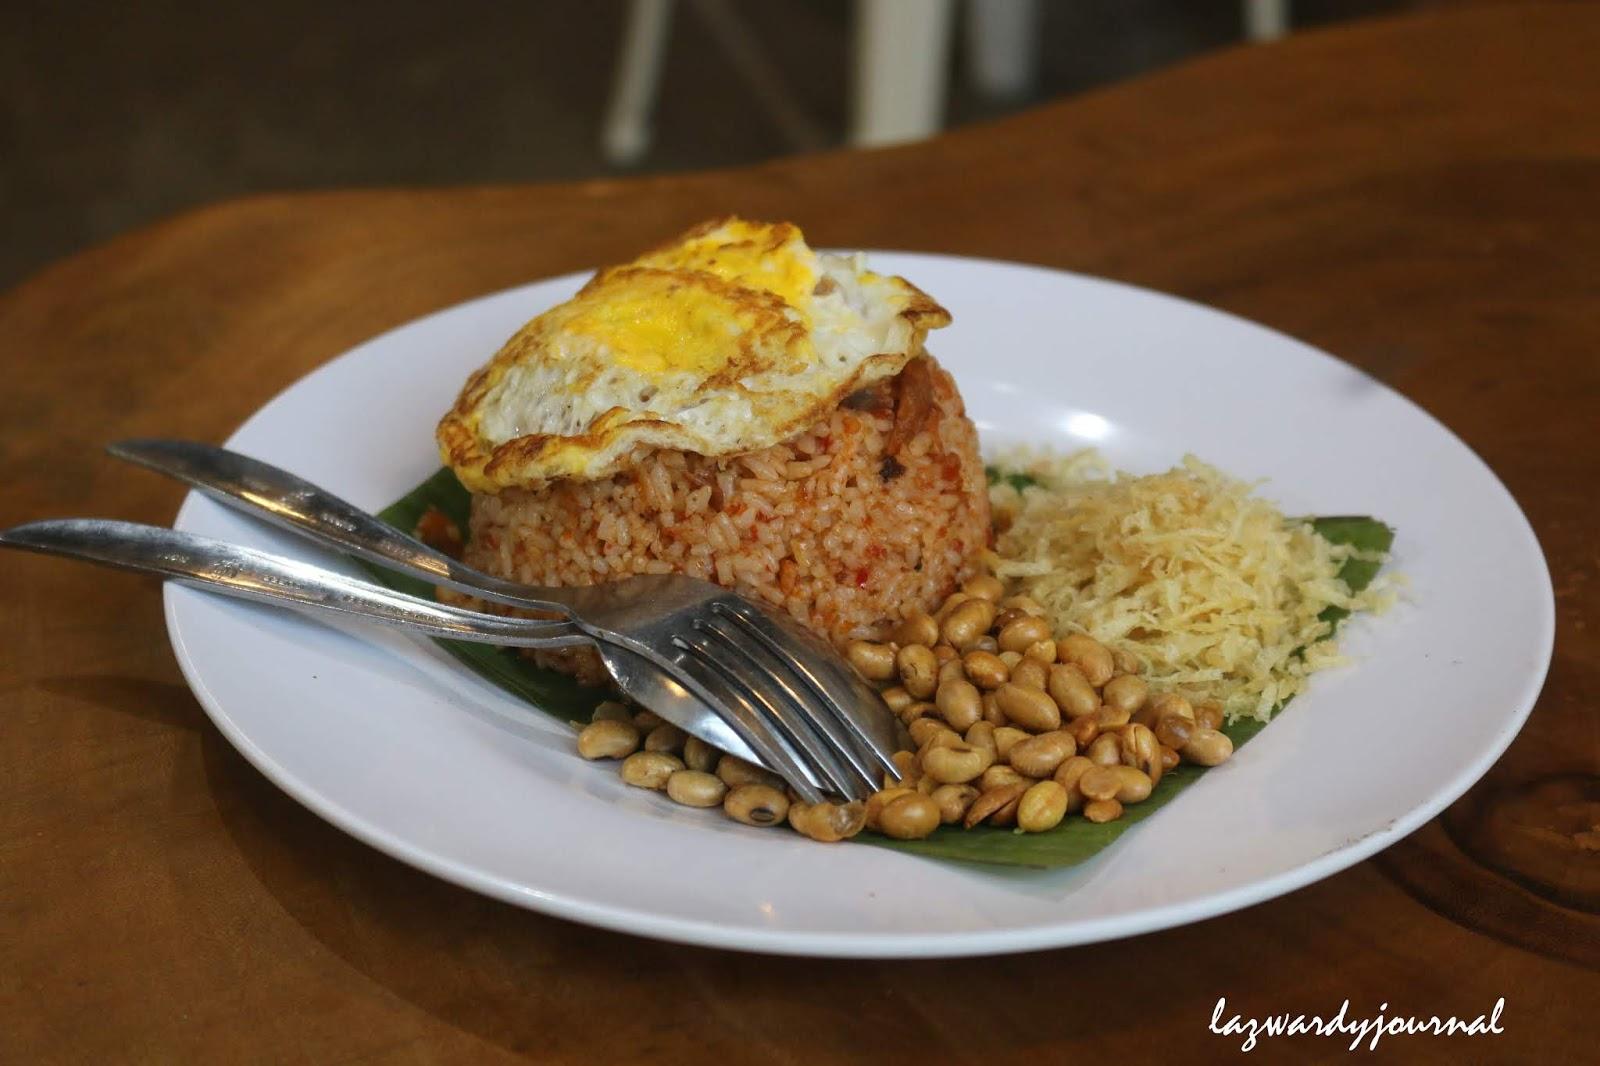 Lezatnya Nasi Goreng Puyung Ala Acibara Coffee Lazwardy